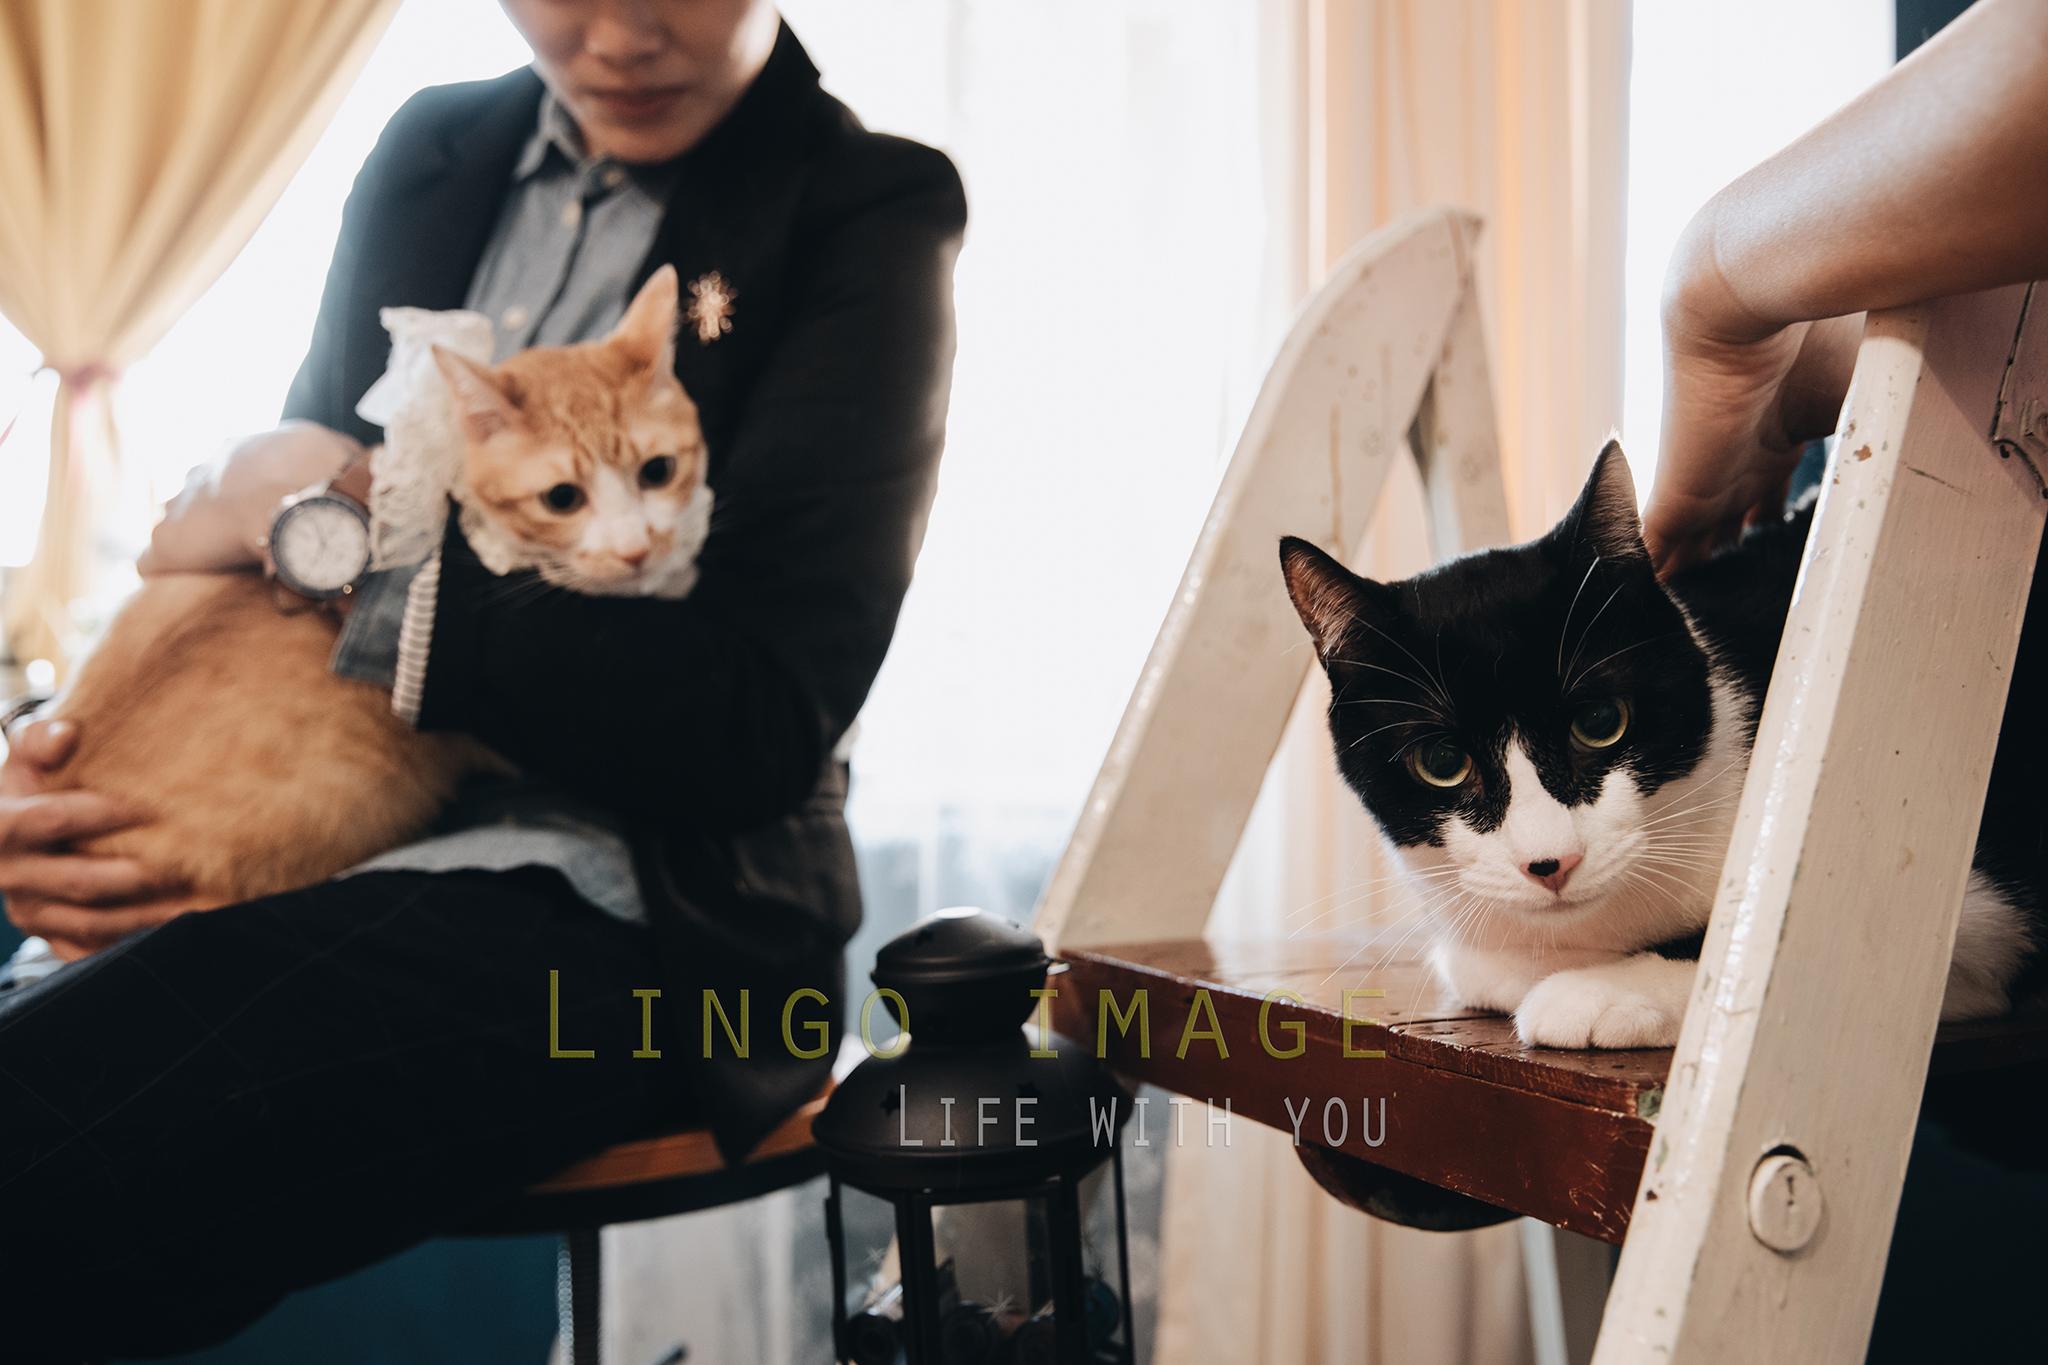 Lingo image_寵物8